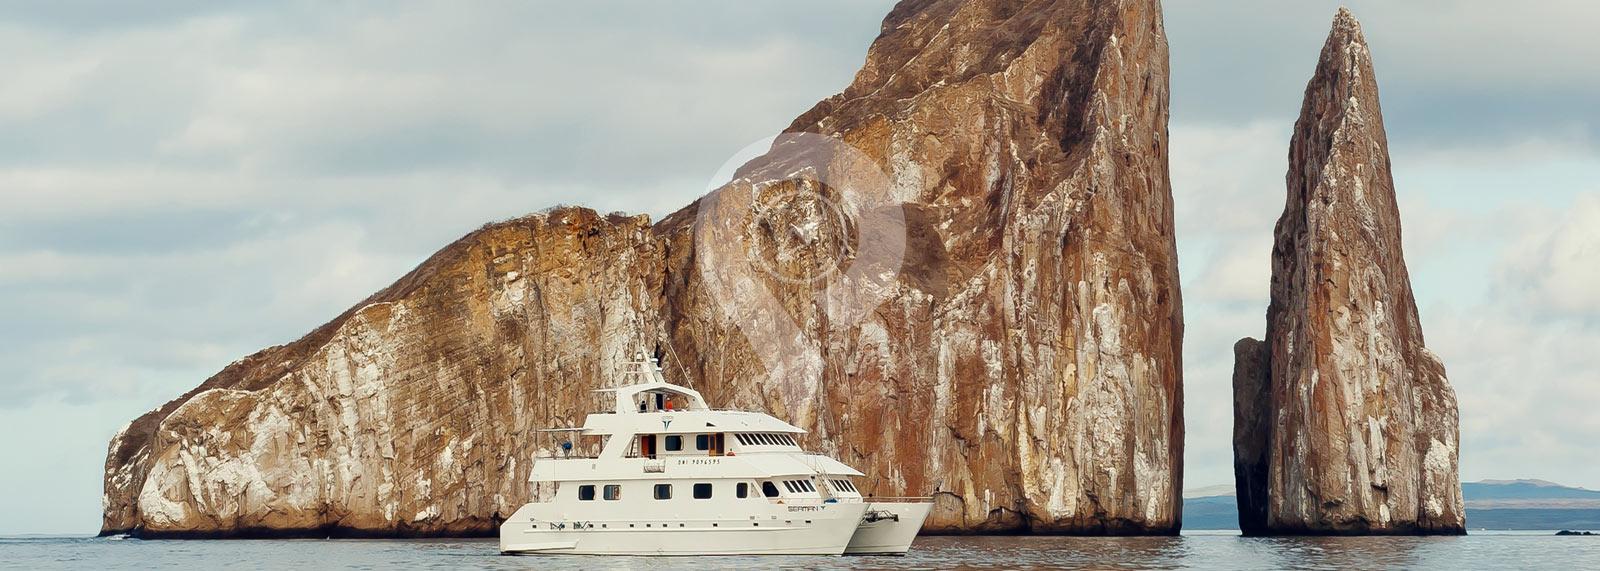 Seaman Journey Galapagos Catamaran